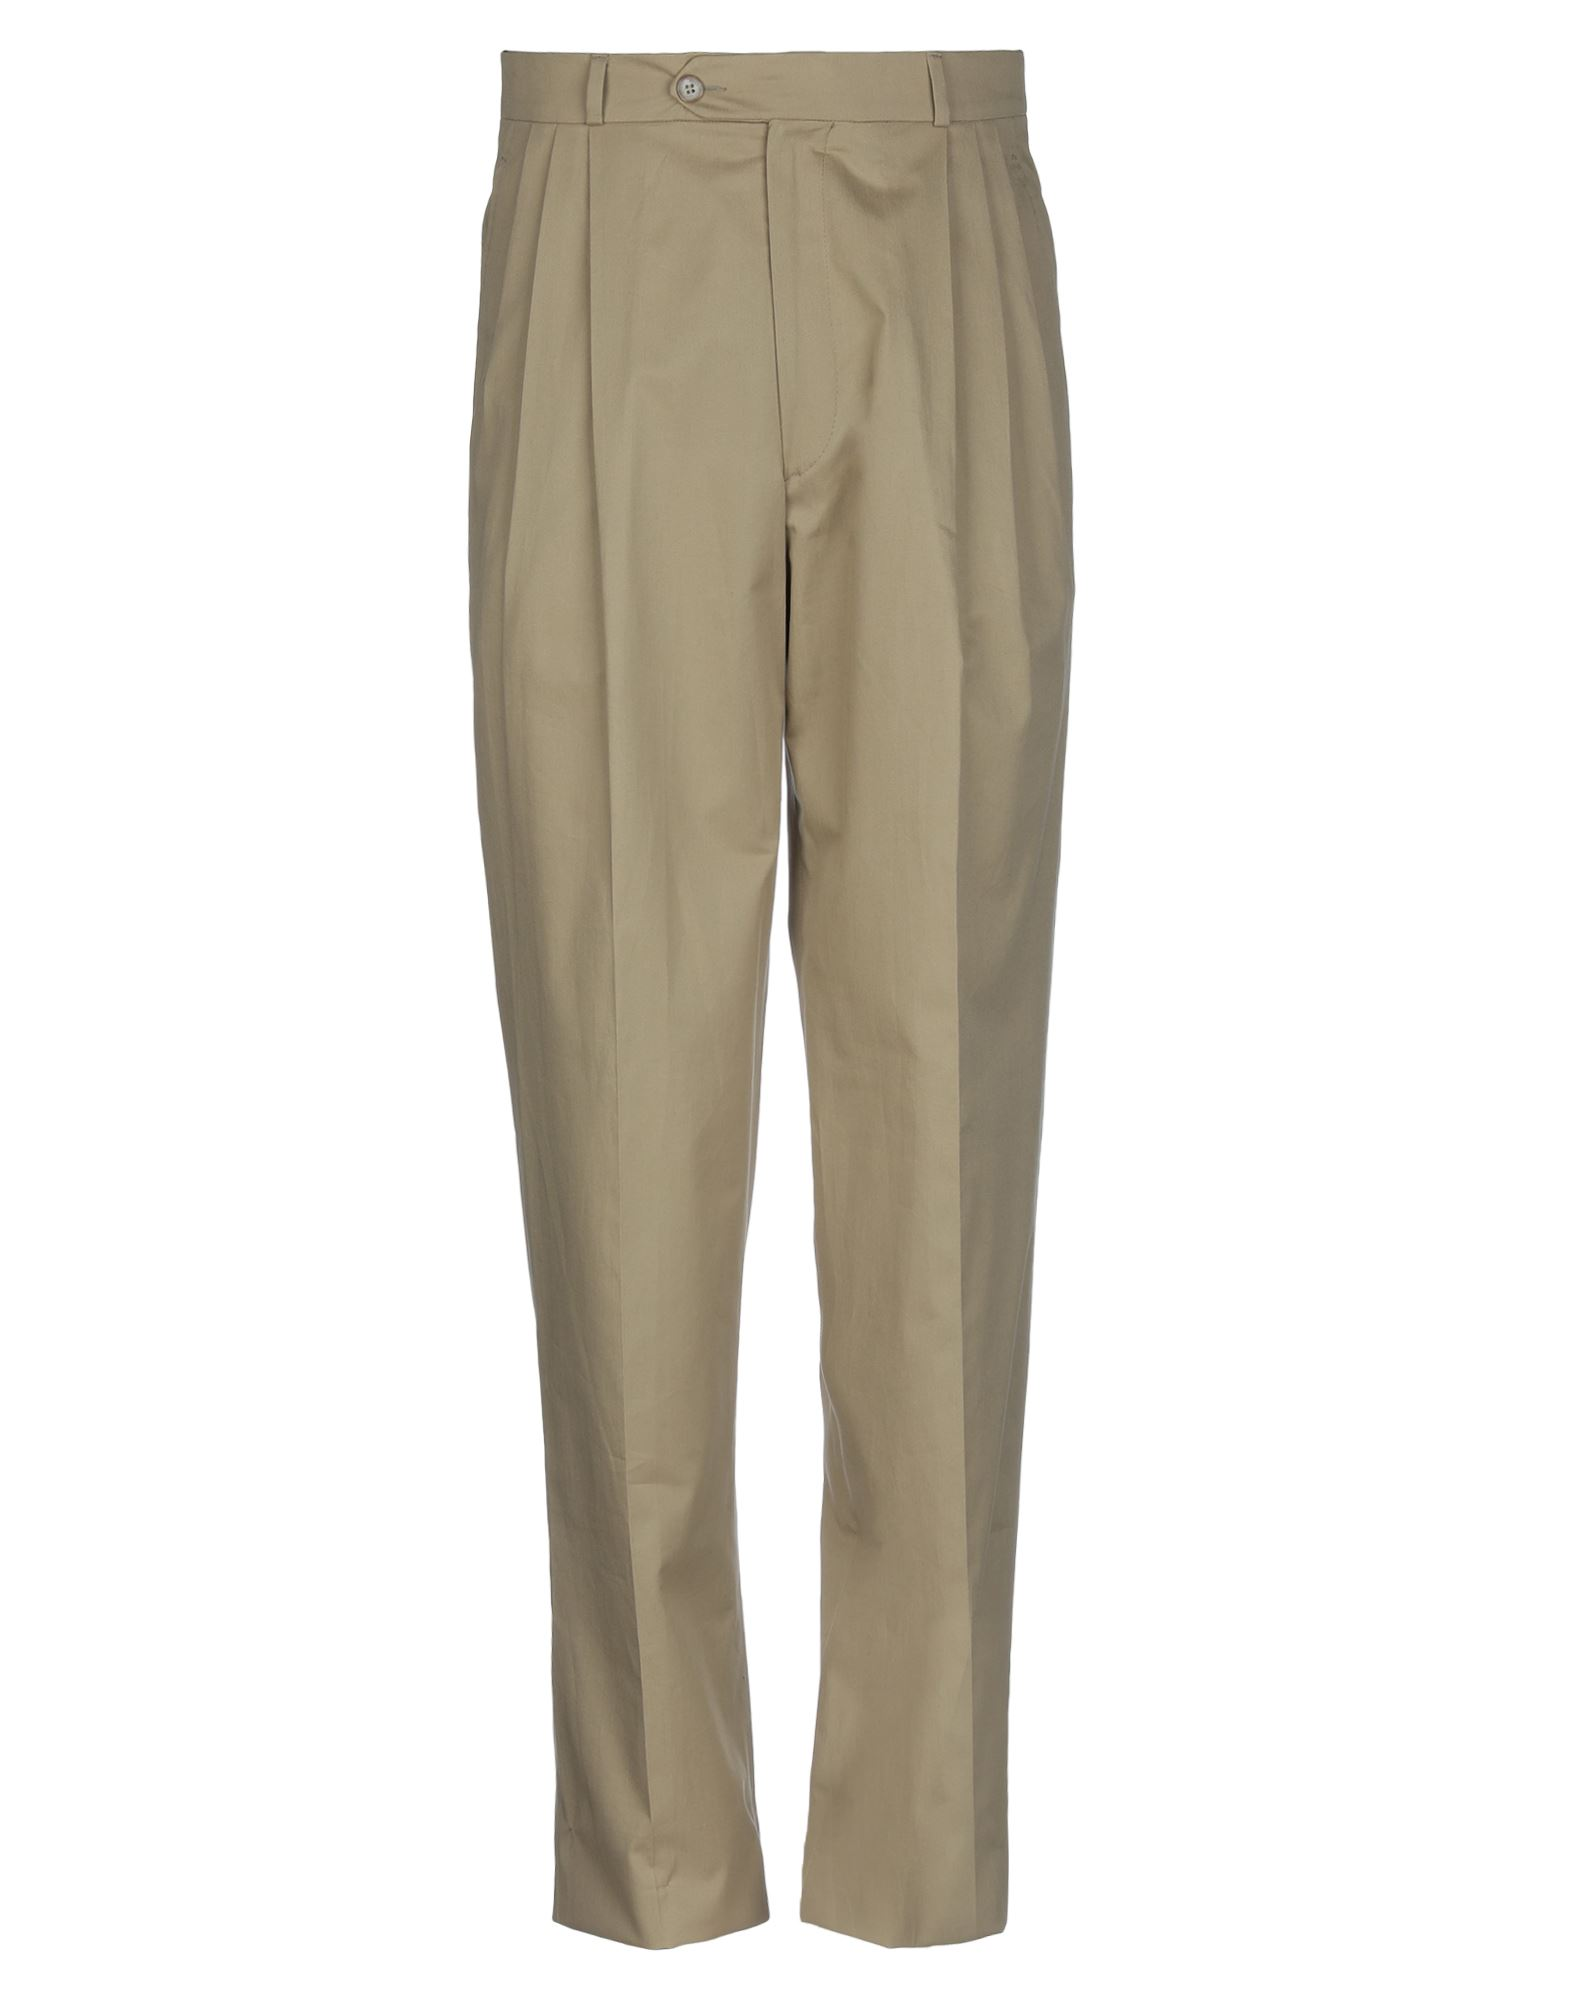 YOOX.COM(ユークス)《セール開催中》JOHN MAC KAY メンズ パンツ キャメル 46 コットン 100%